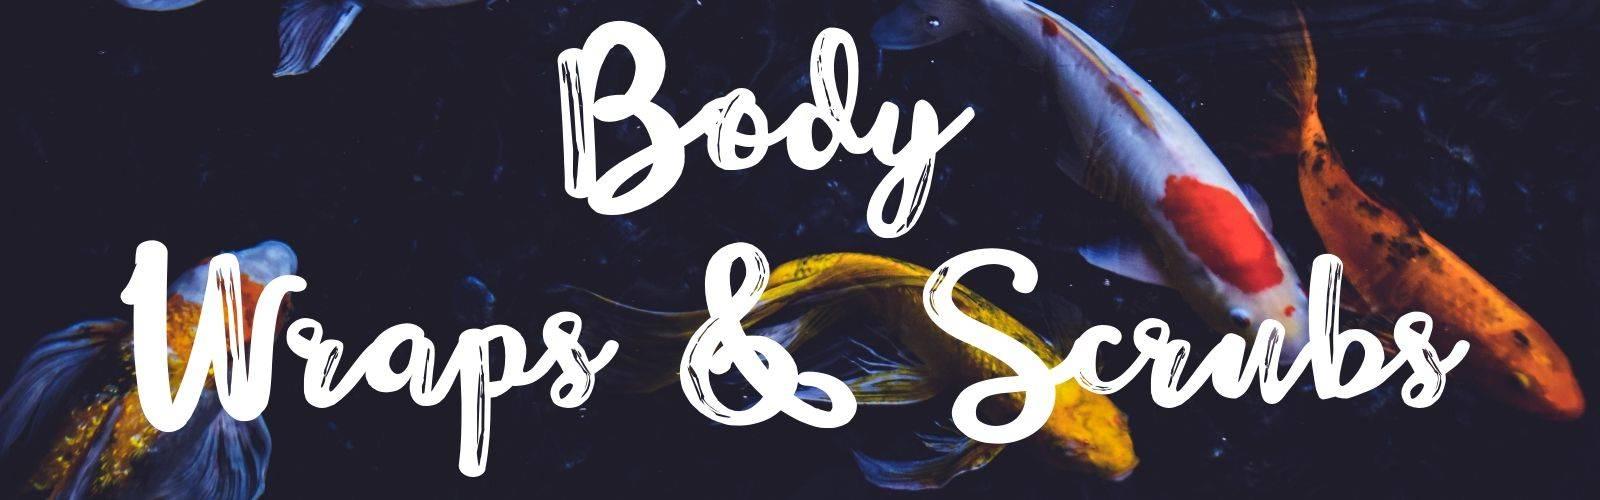 Body Wraps & Scrubs in Hot Springs, AR | Thai-Me Spa